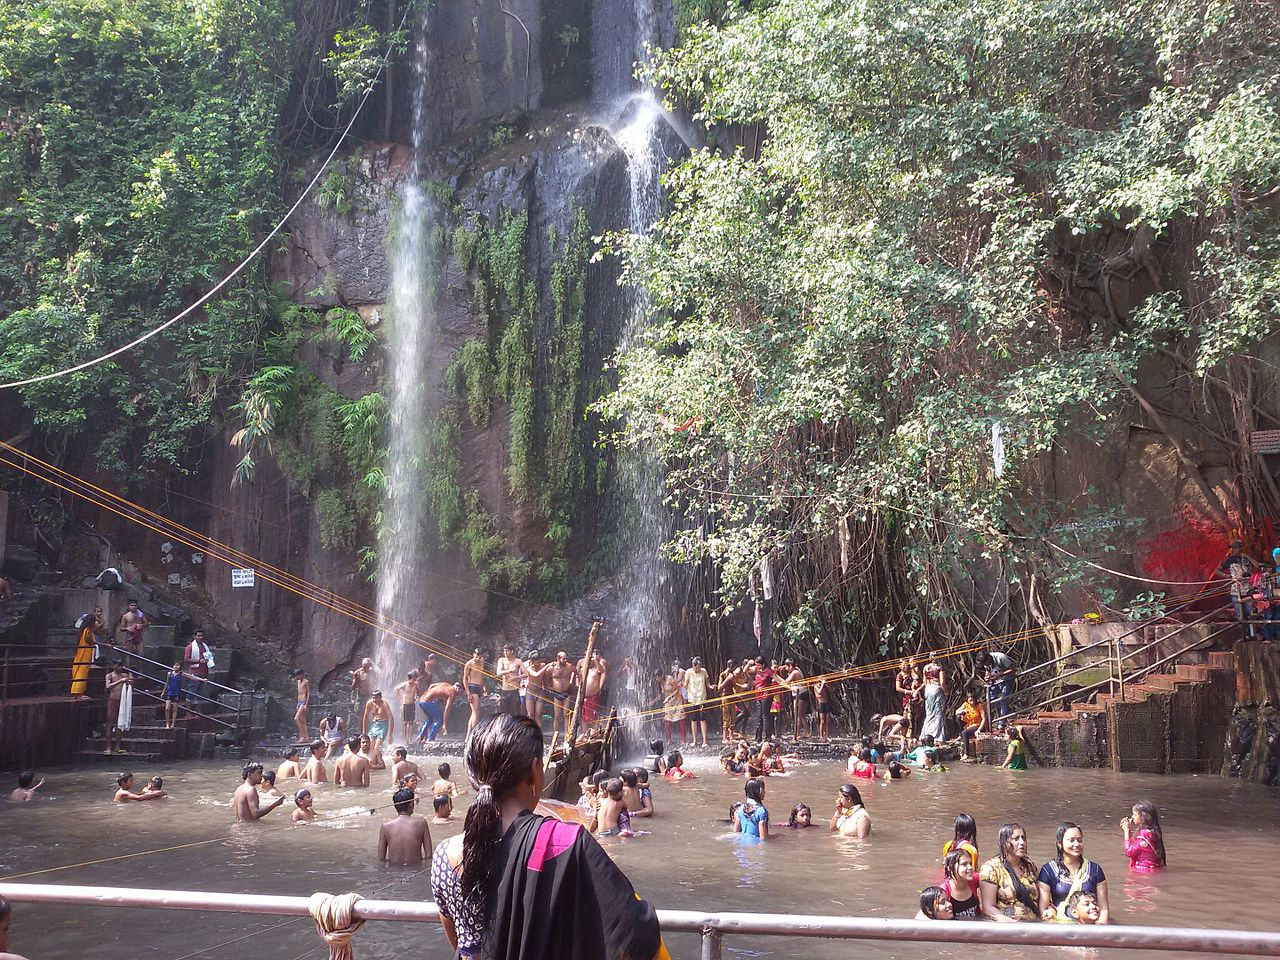 Kakolat Falls - Top Rated Place to Visit in Nawada, Bihar